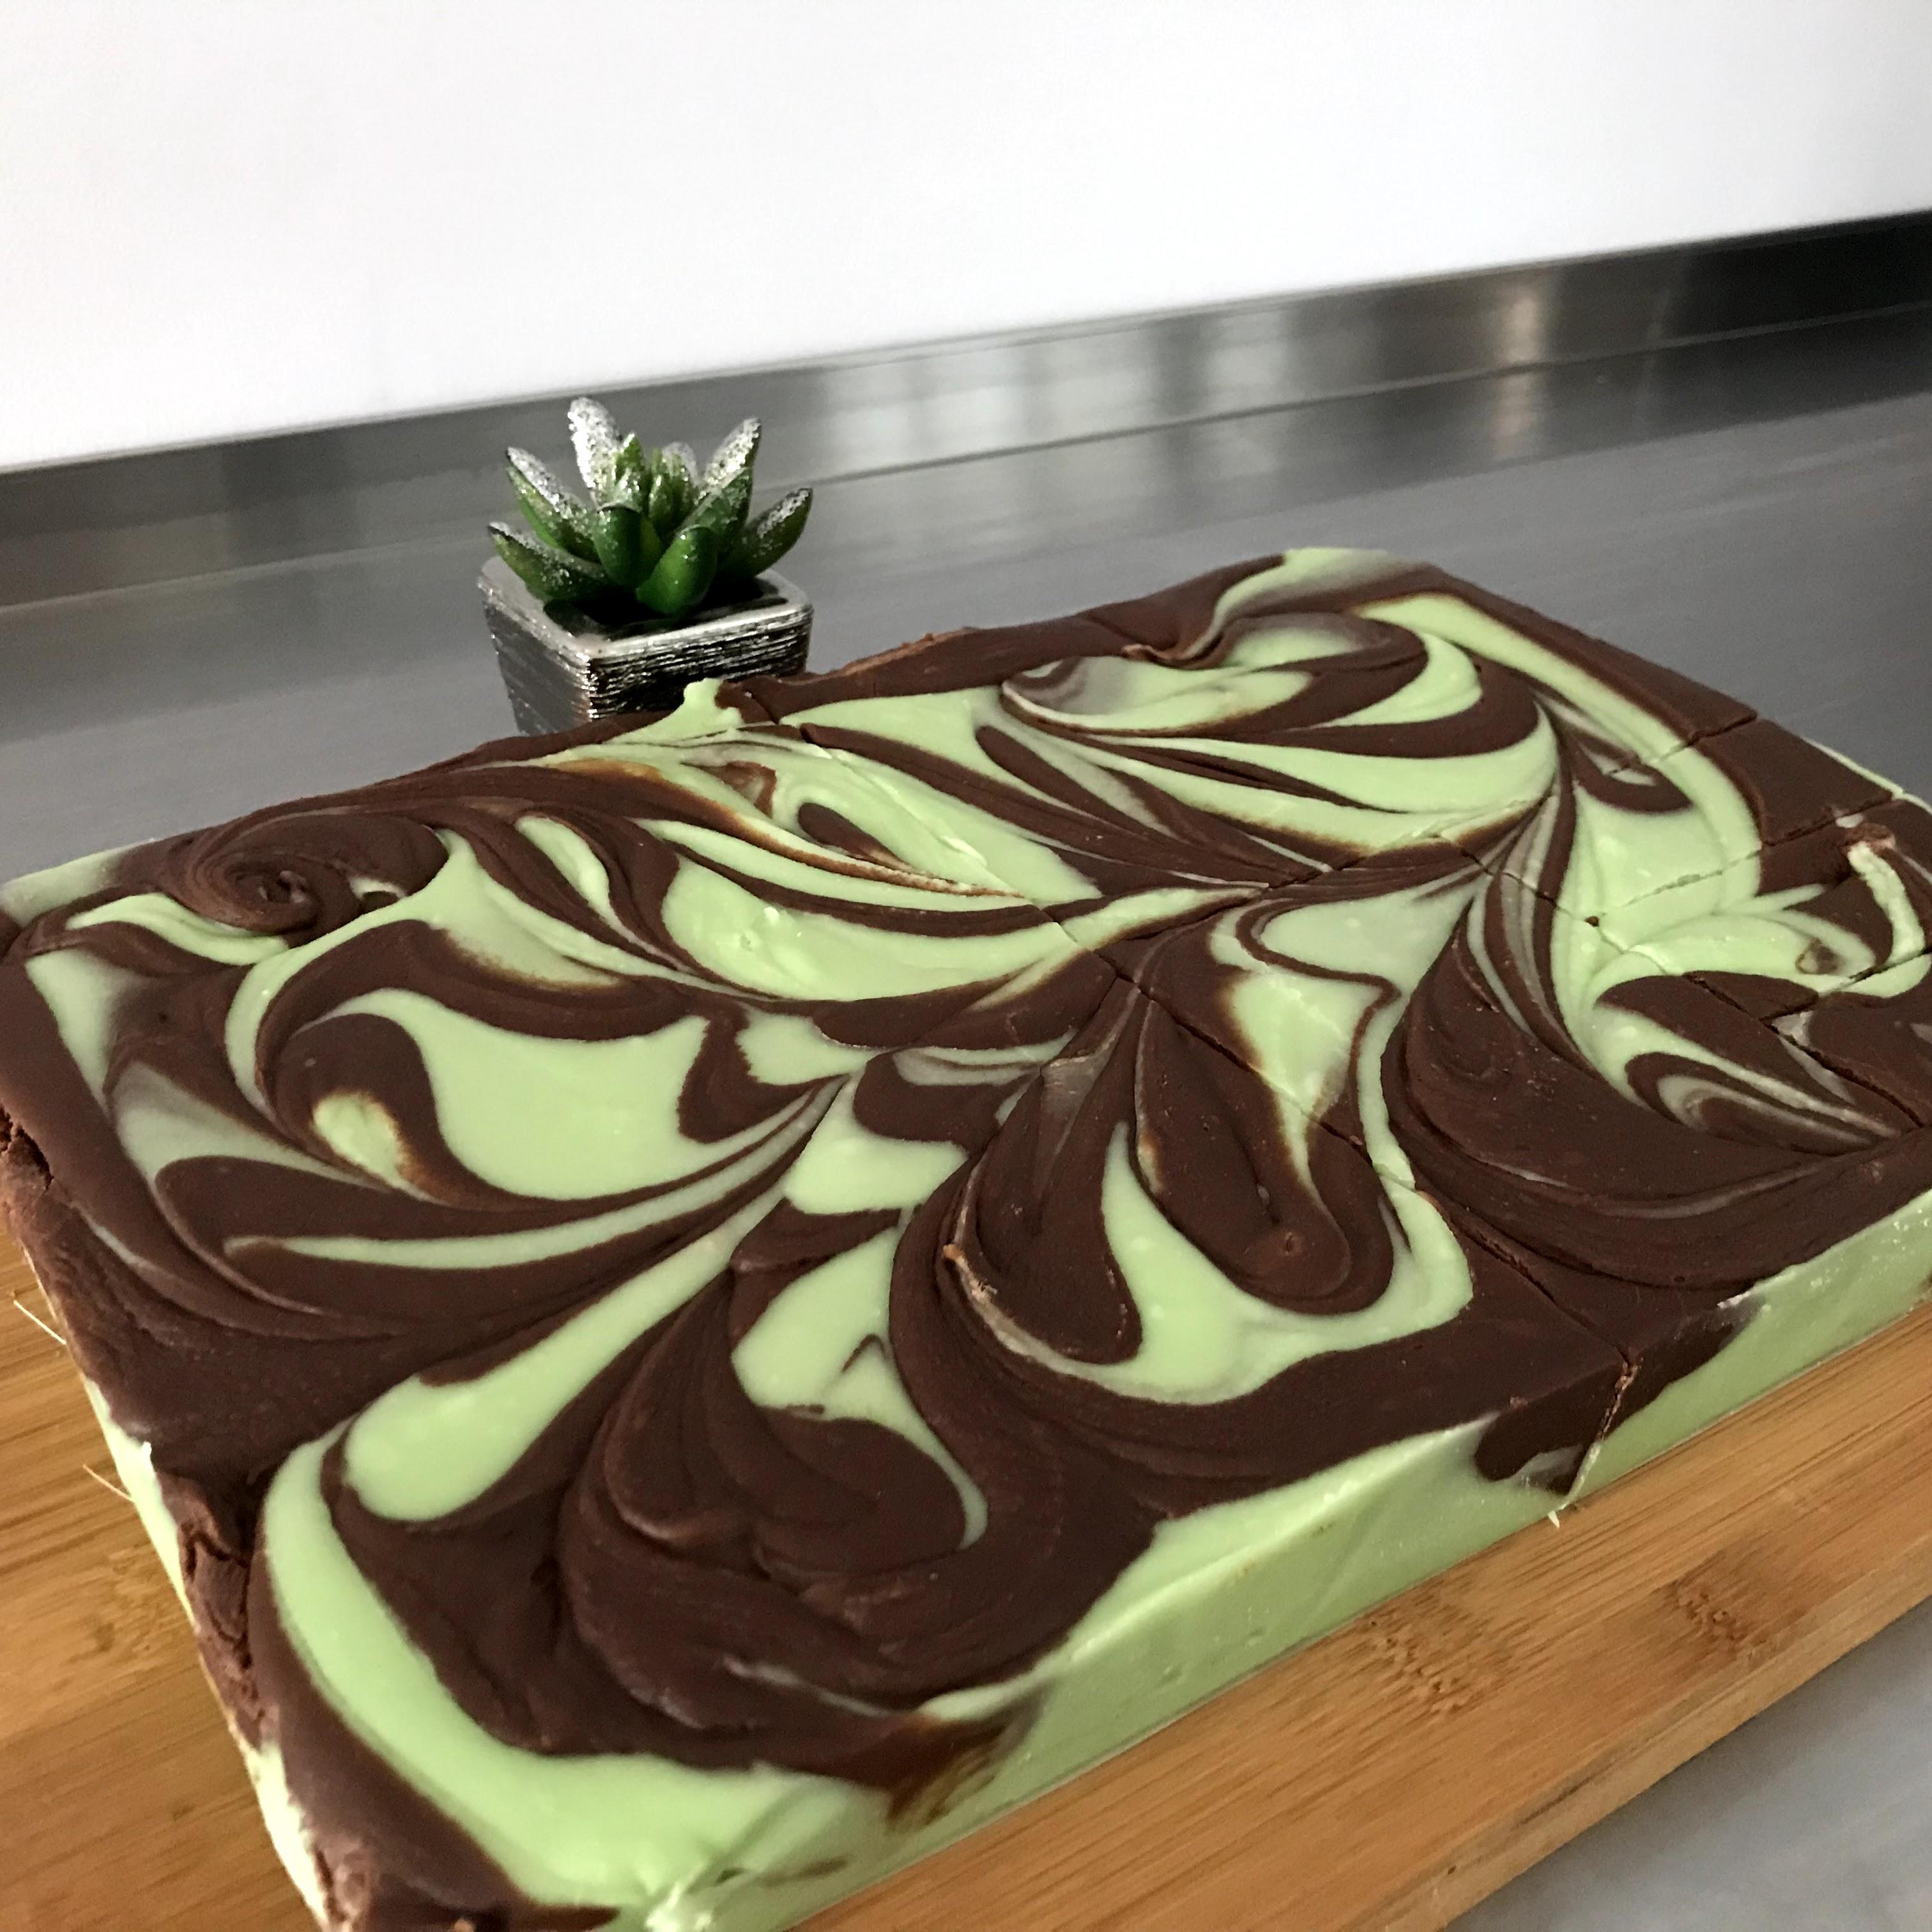 Thumbnail: Chocolate Mint